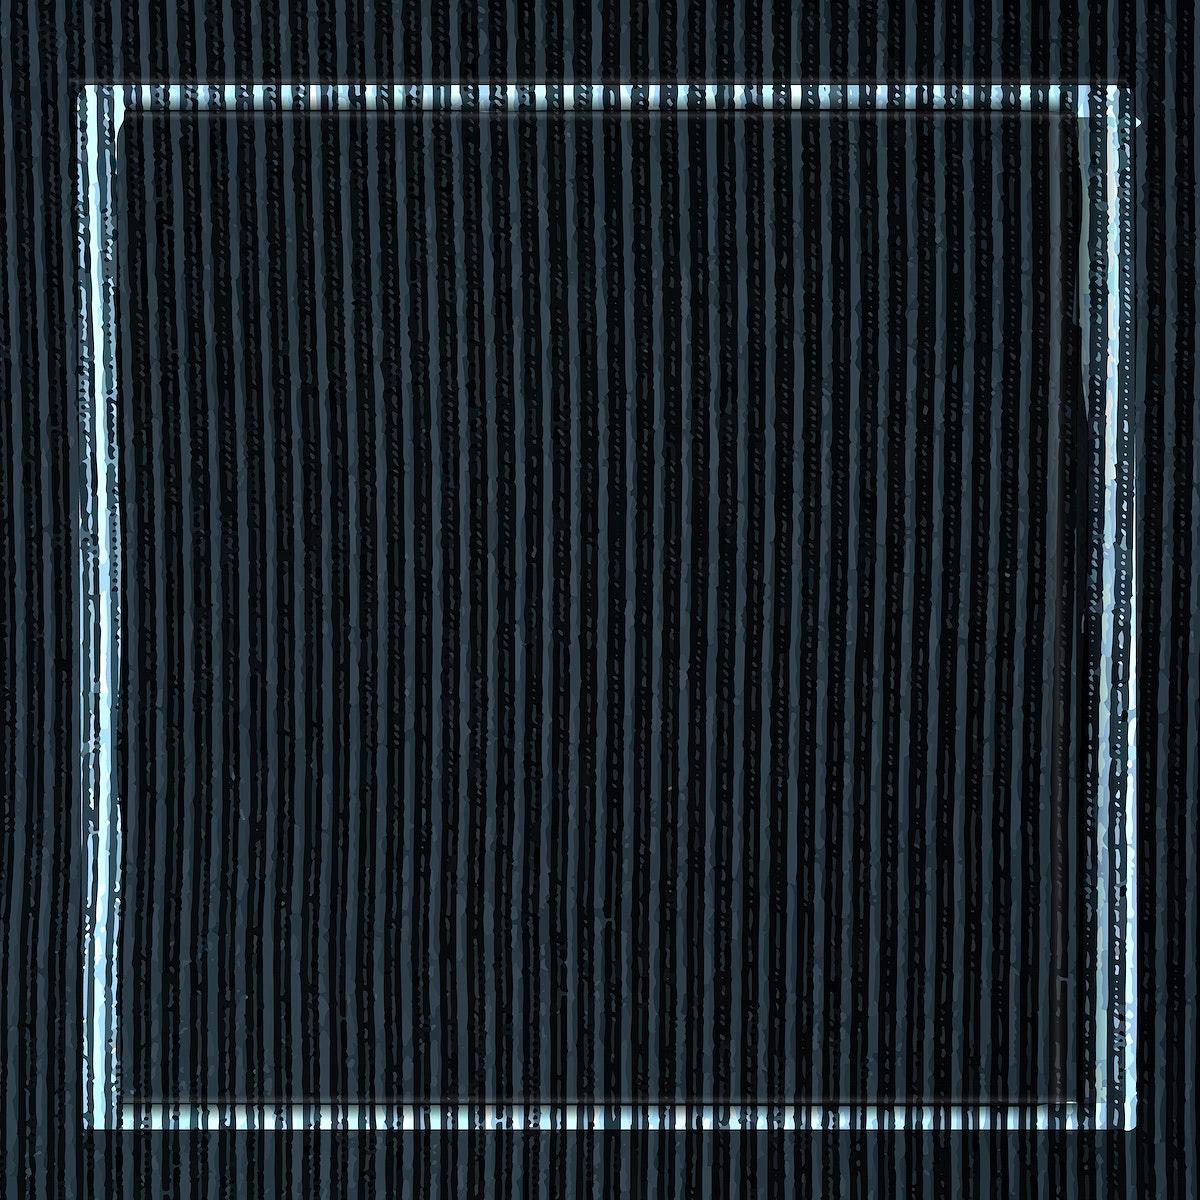 Blue frame on navy blue corduroy textured background vector